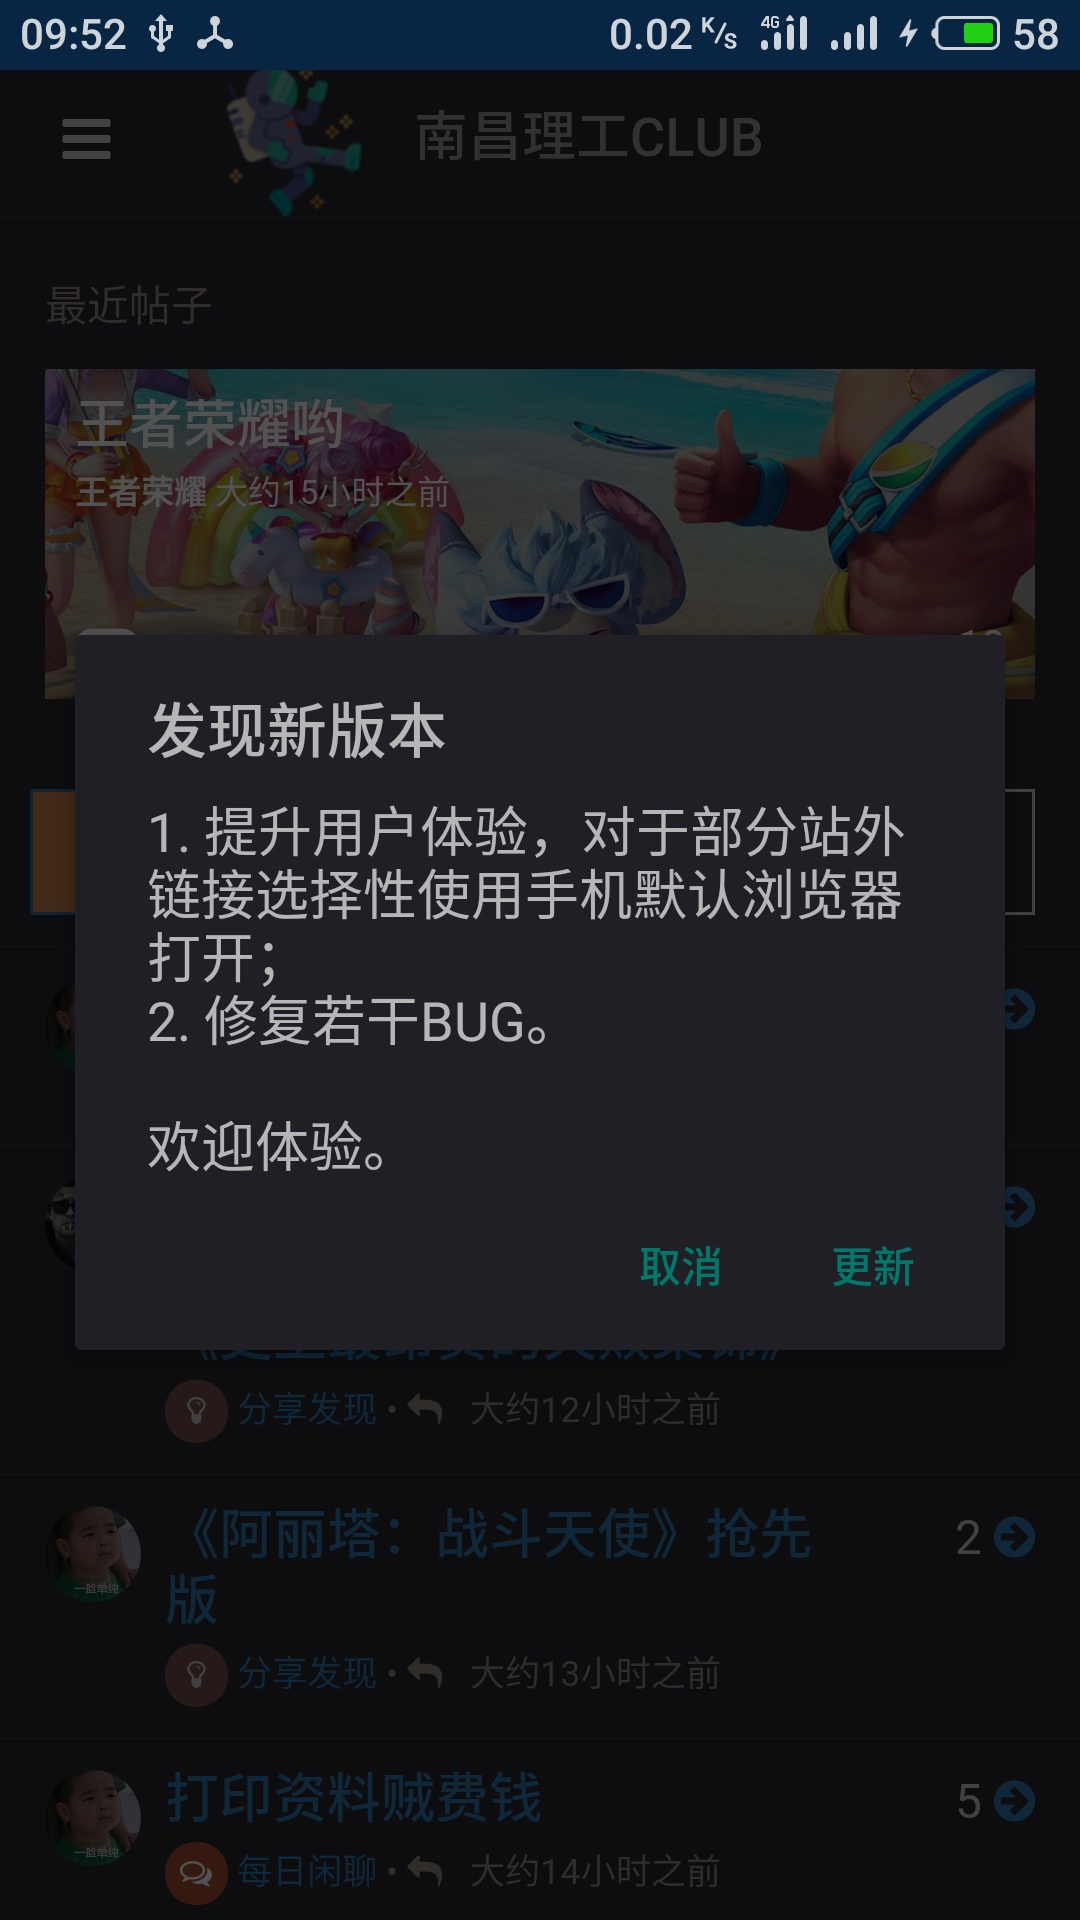 S90309-095201.jpg